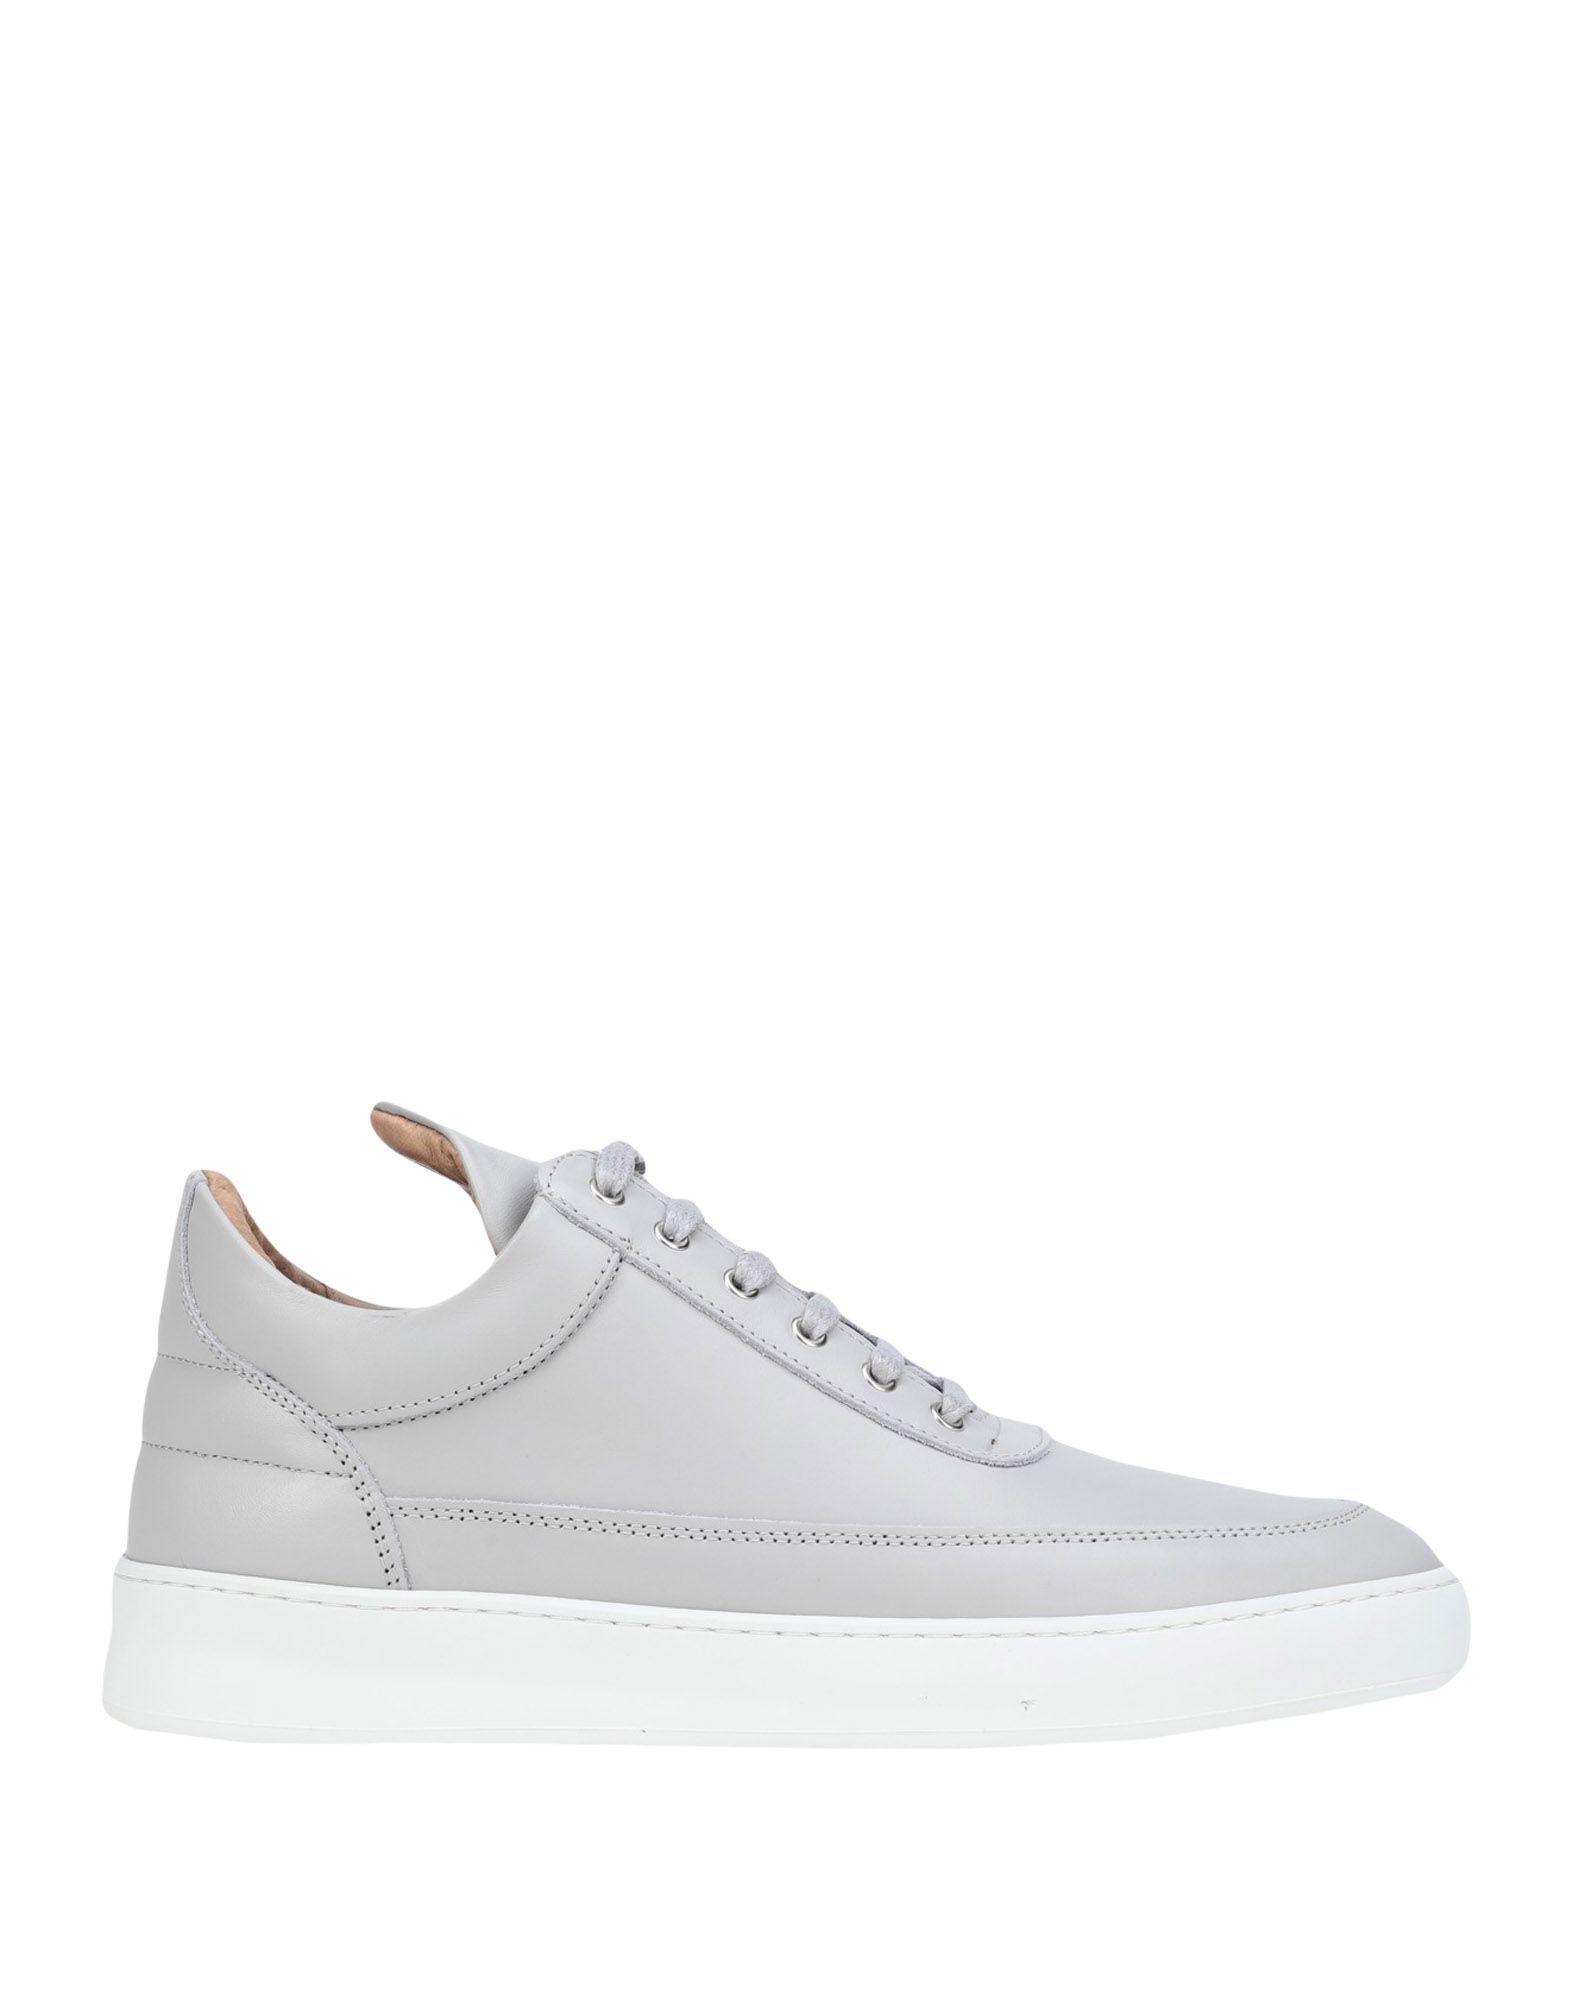 Pieces Sneakersfillingpiecesshoes Sneakersfillingpiecesshoes